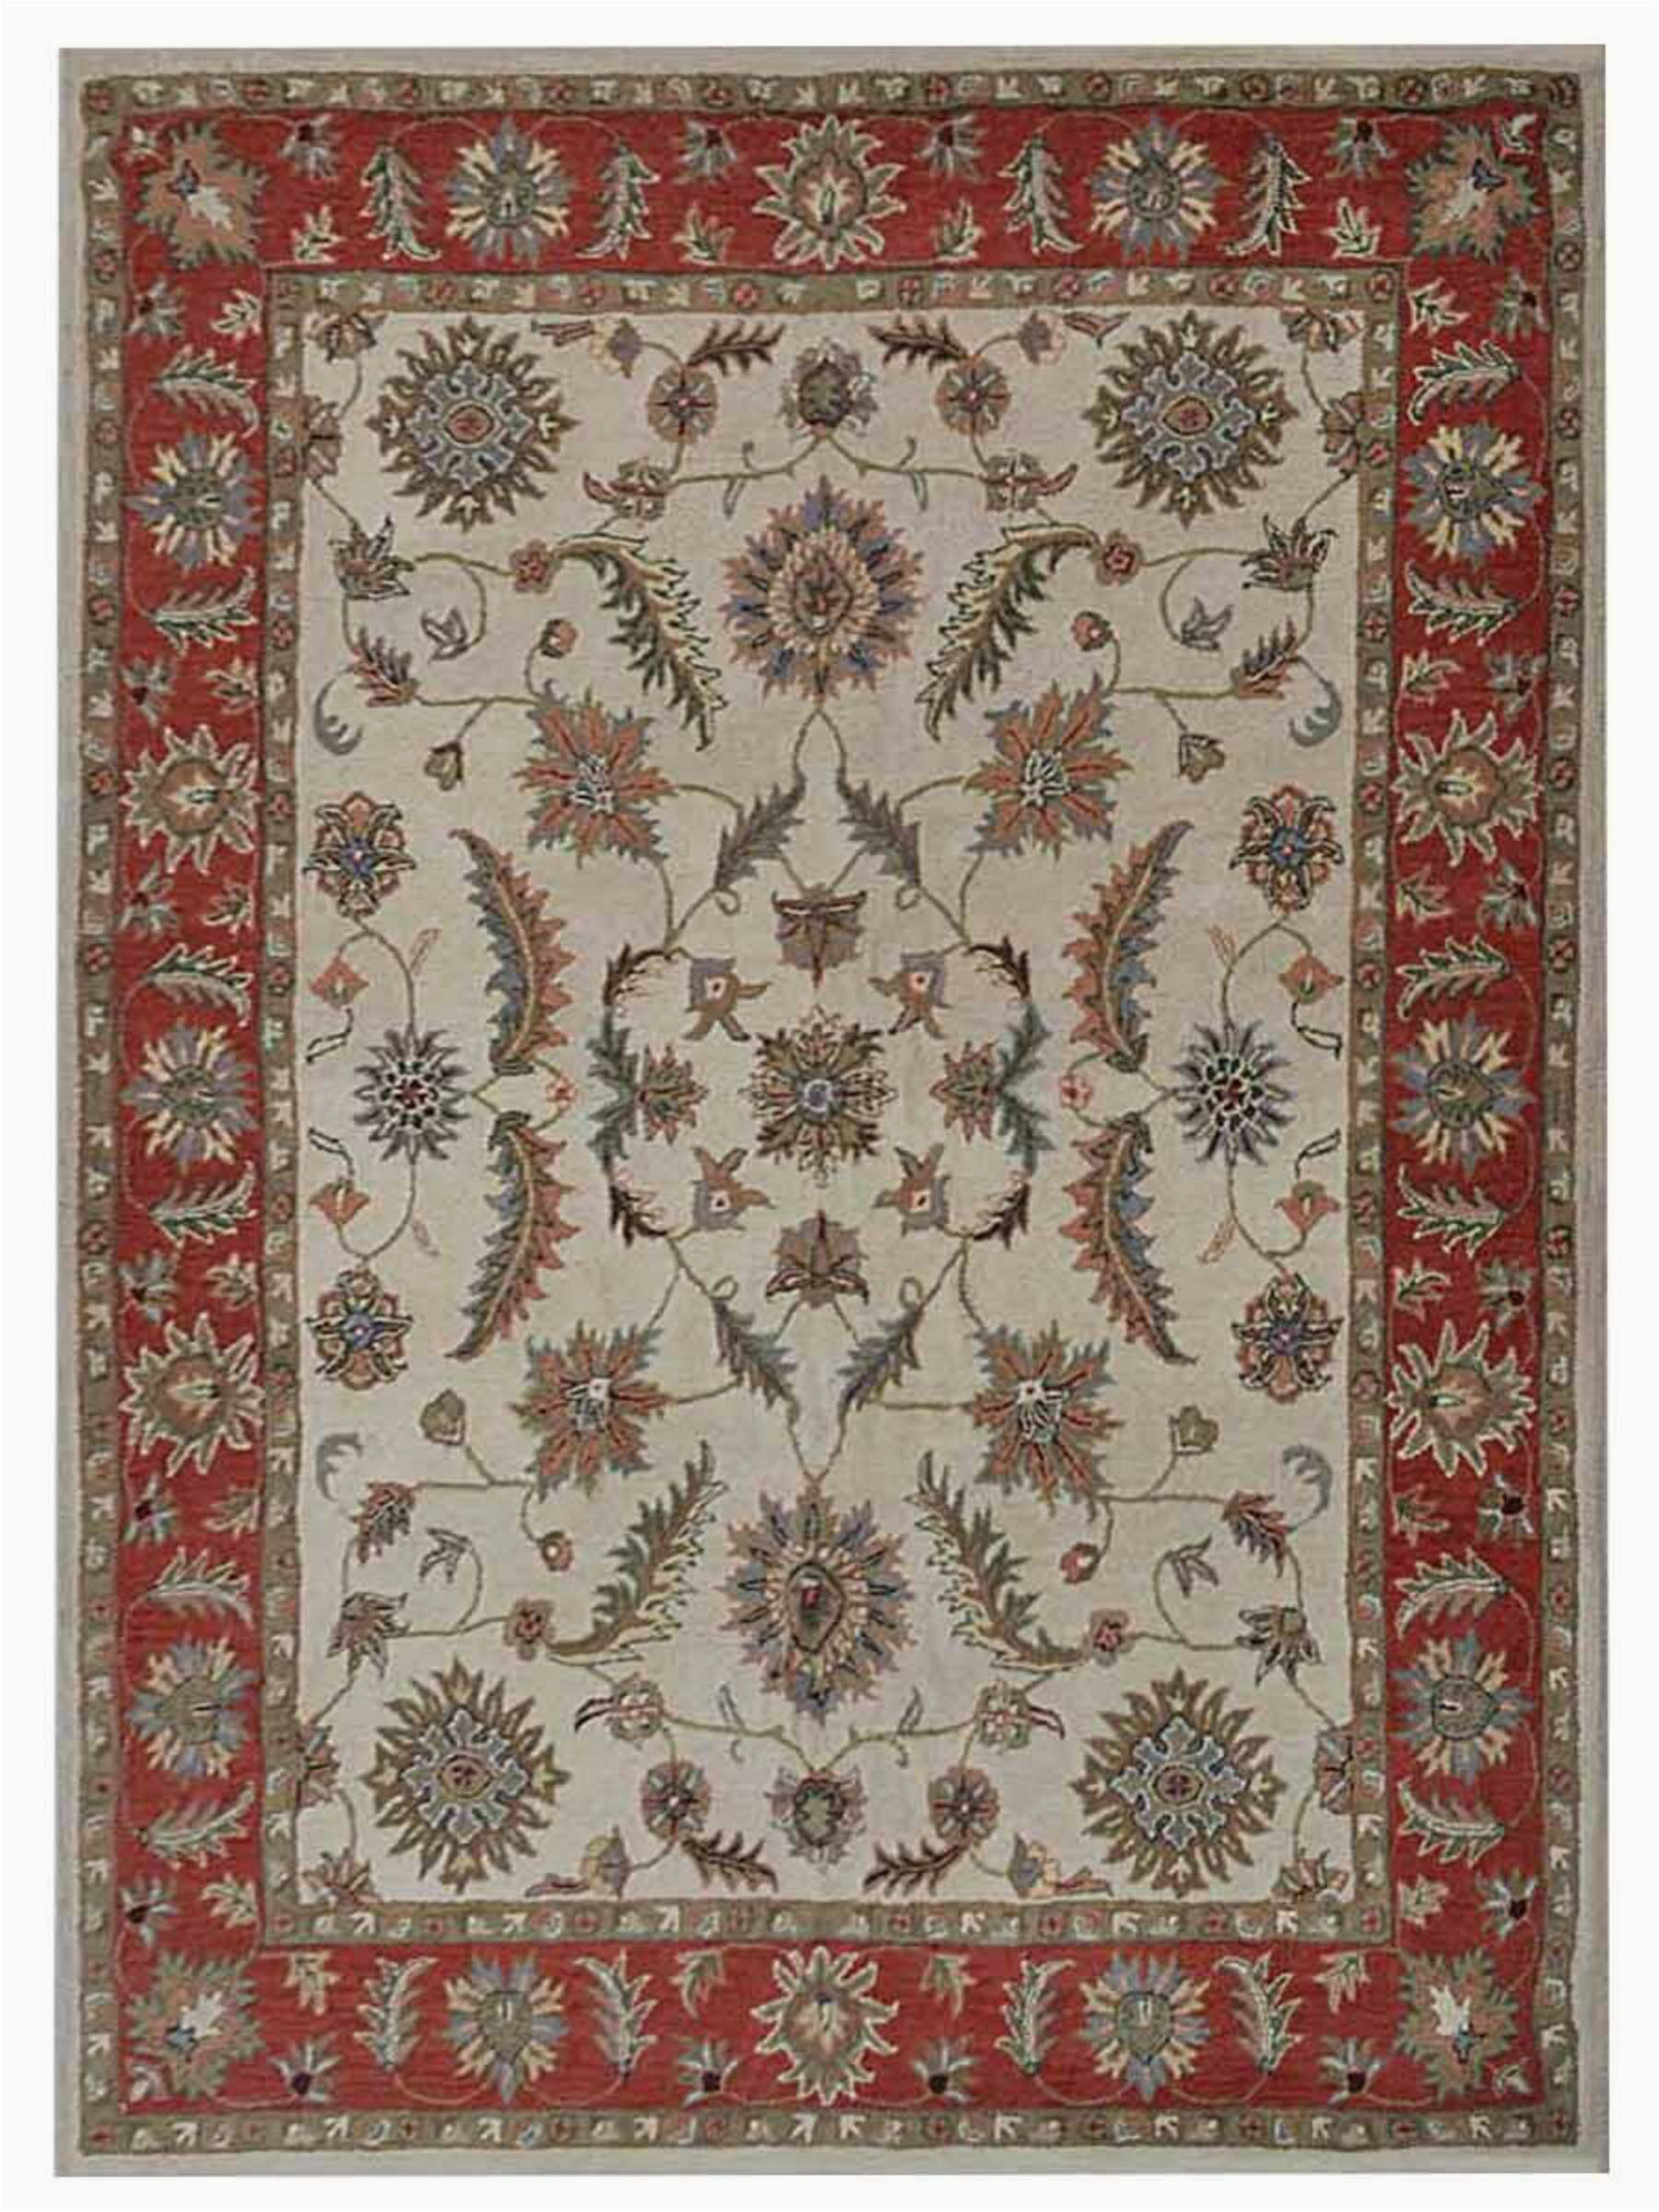 bowman oriental handmade tufted wool creamred area rug